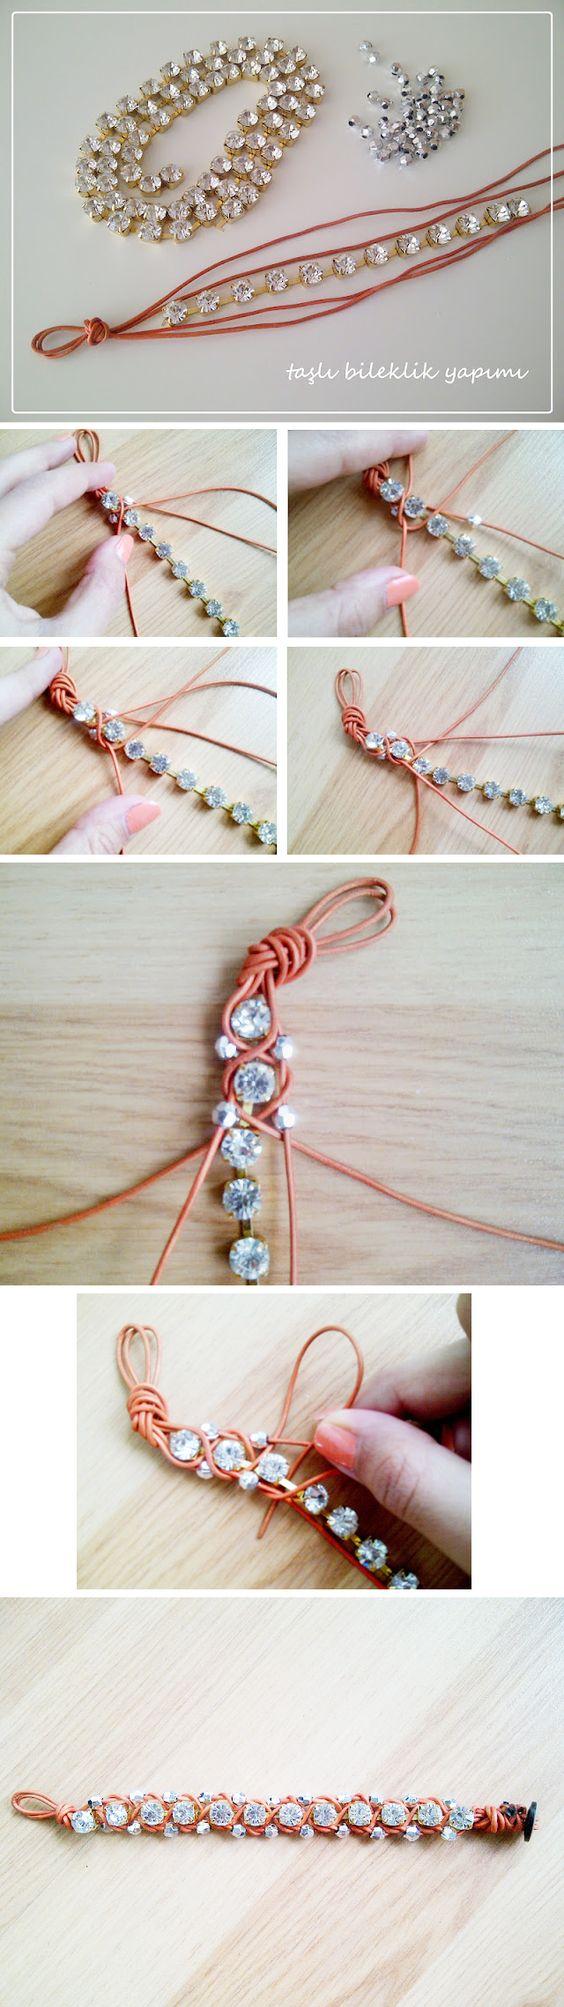 Rhinestones, Bracelets and DIY and crafts -   DIY Rhinestone bracelet Ideas